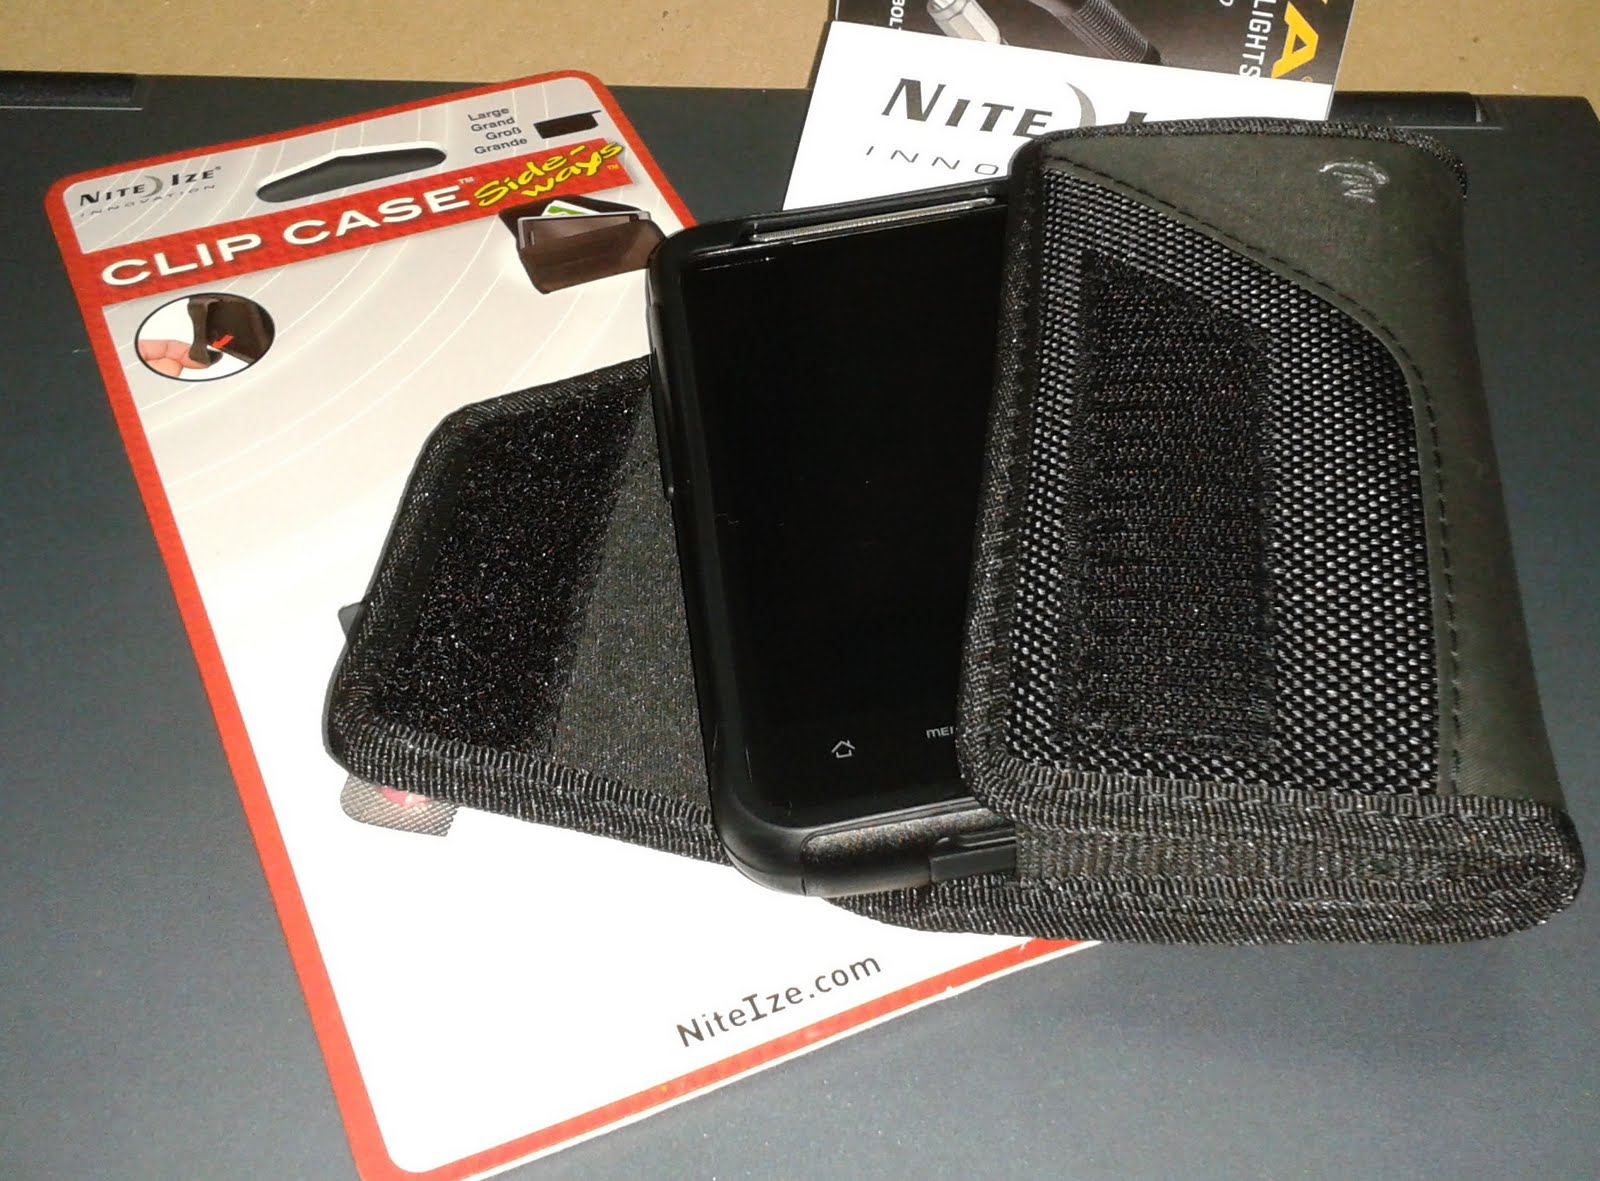 Going online, I found NiteIze's Large Clip Case Sideways. Fits